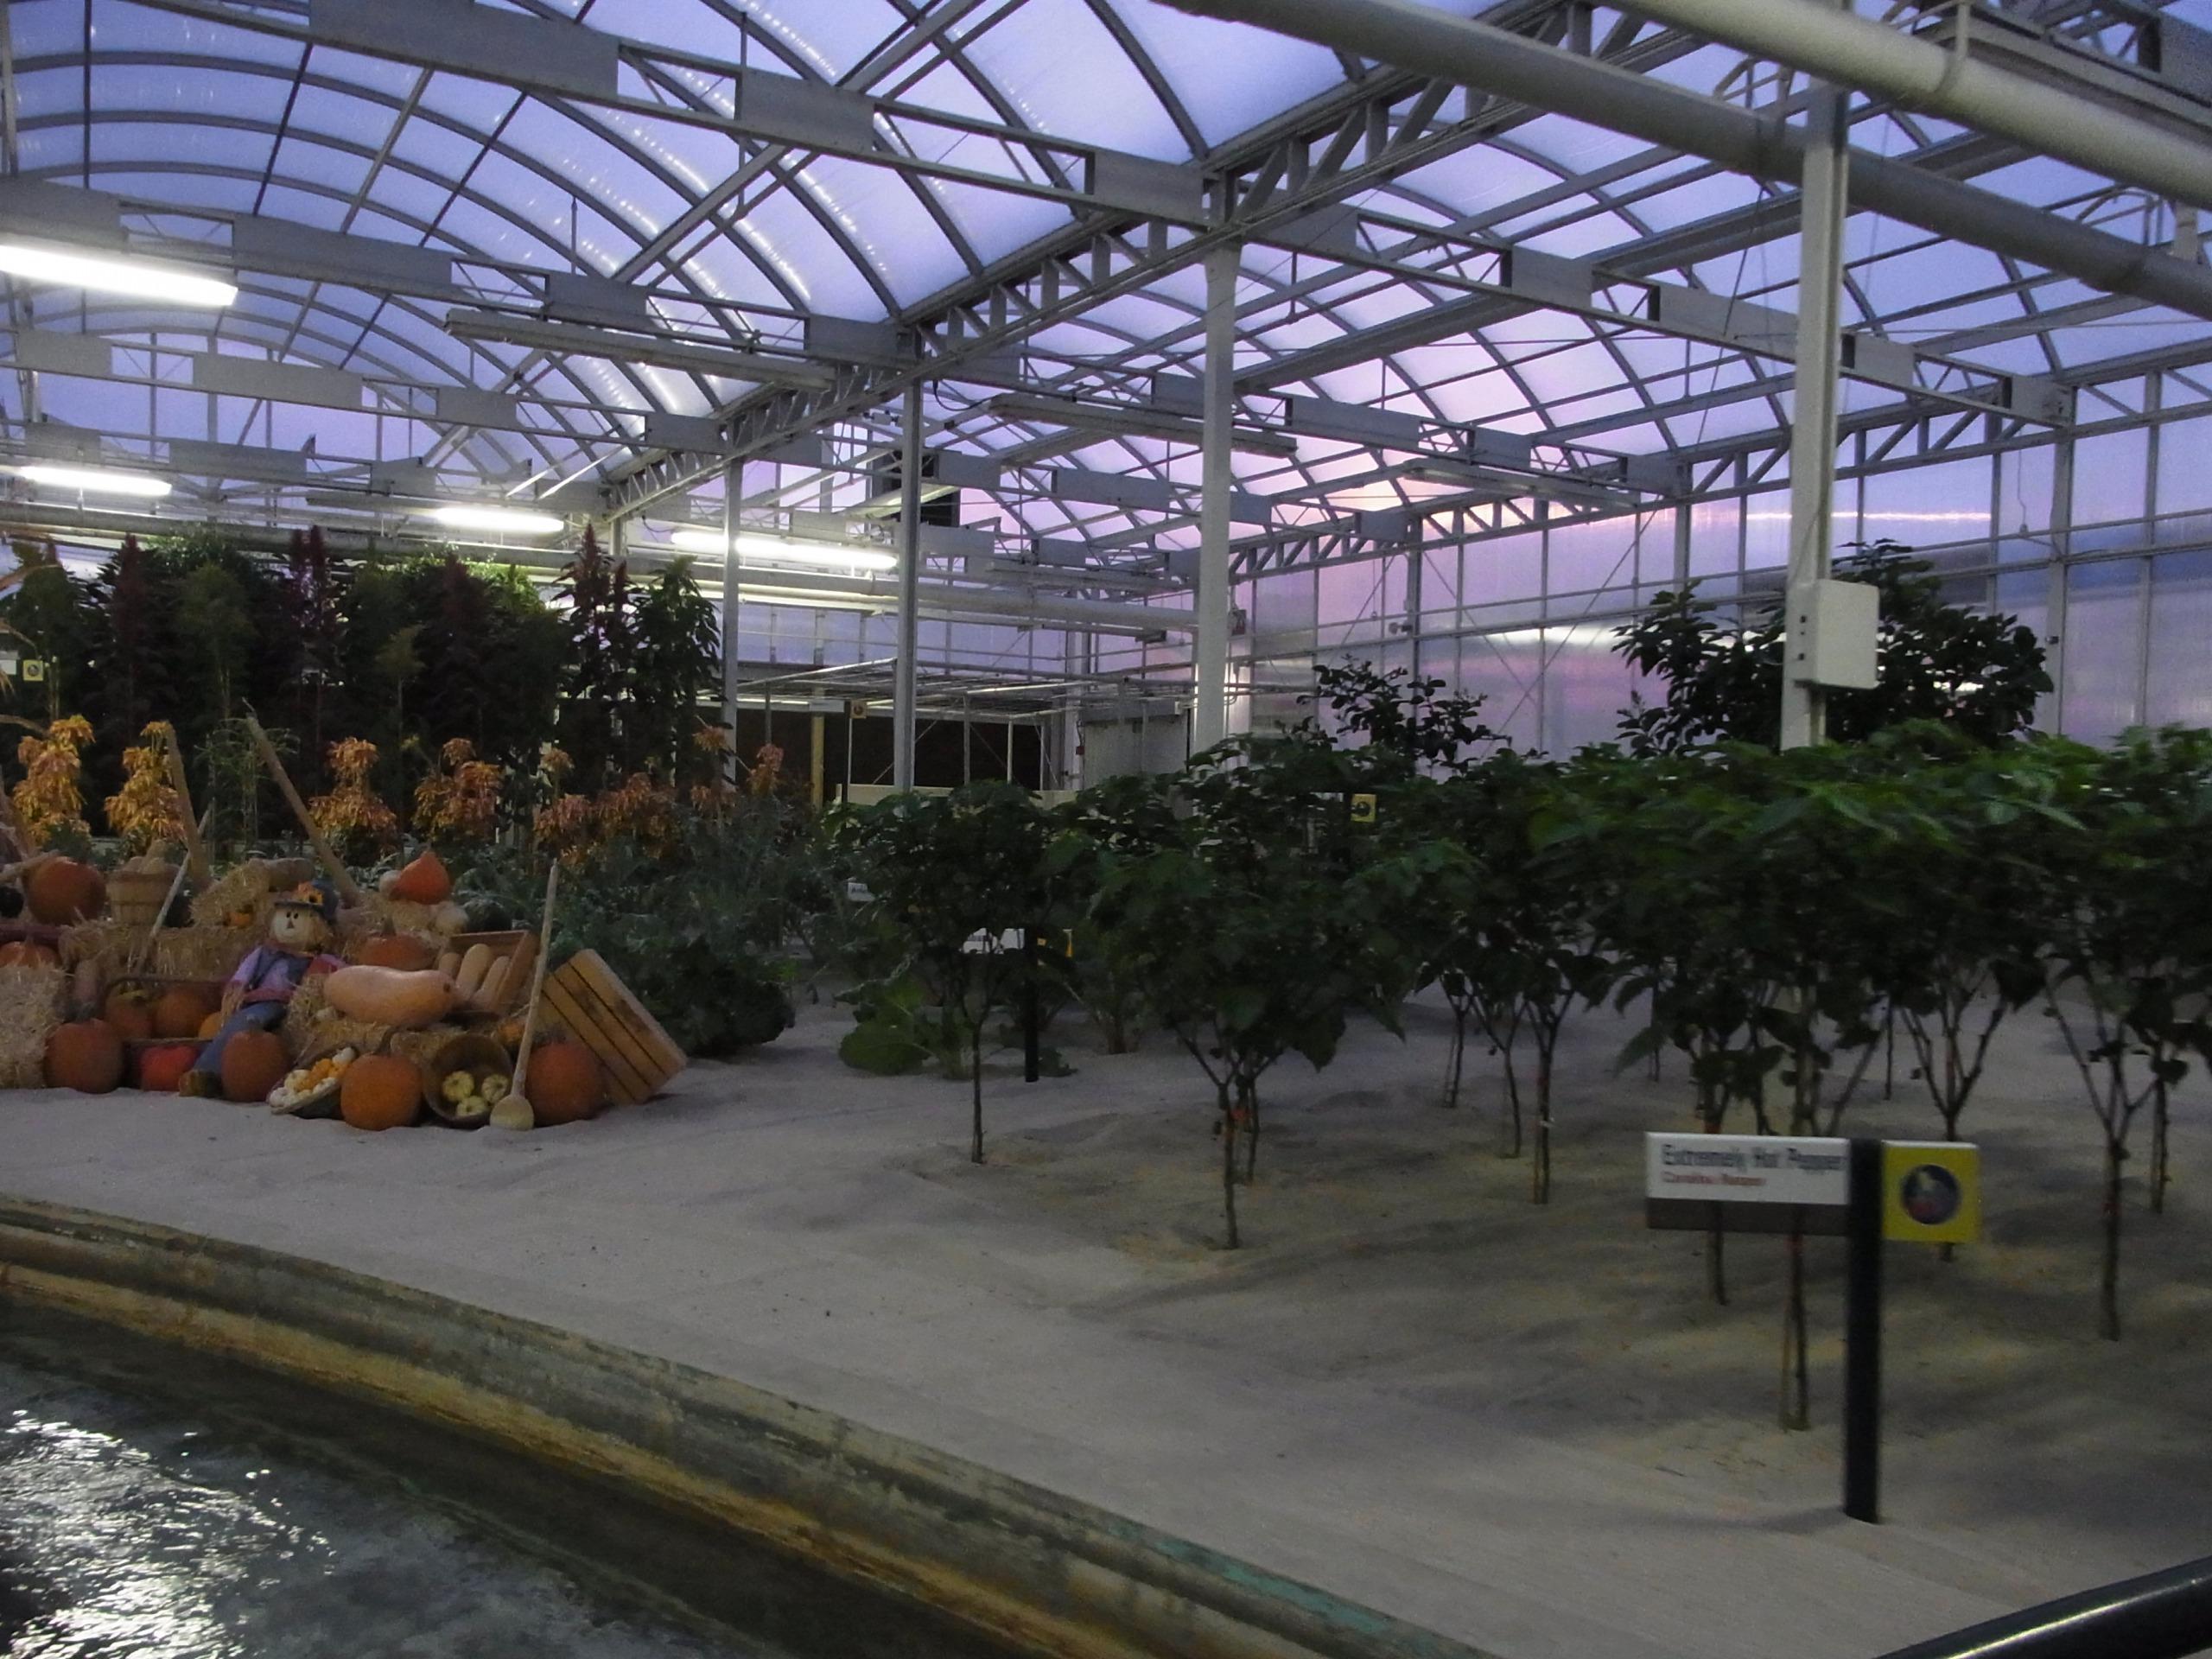 WDW旅行記 71 ガーデングリルでの夕食の前にリビング・ウィズ・ザ・ランドで予習